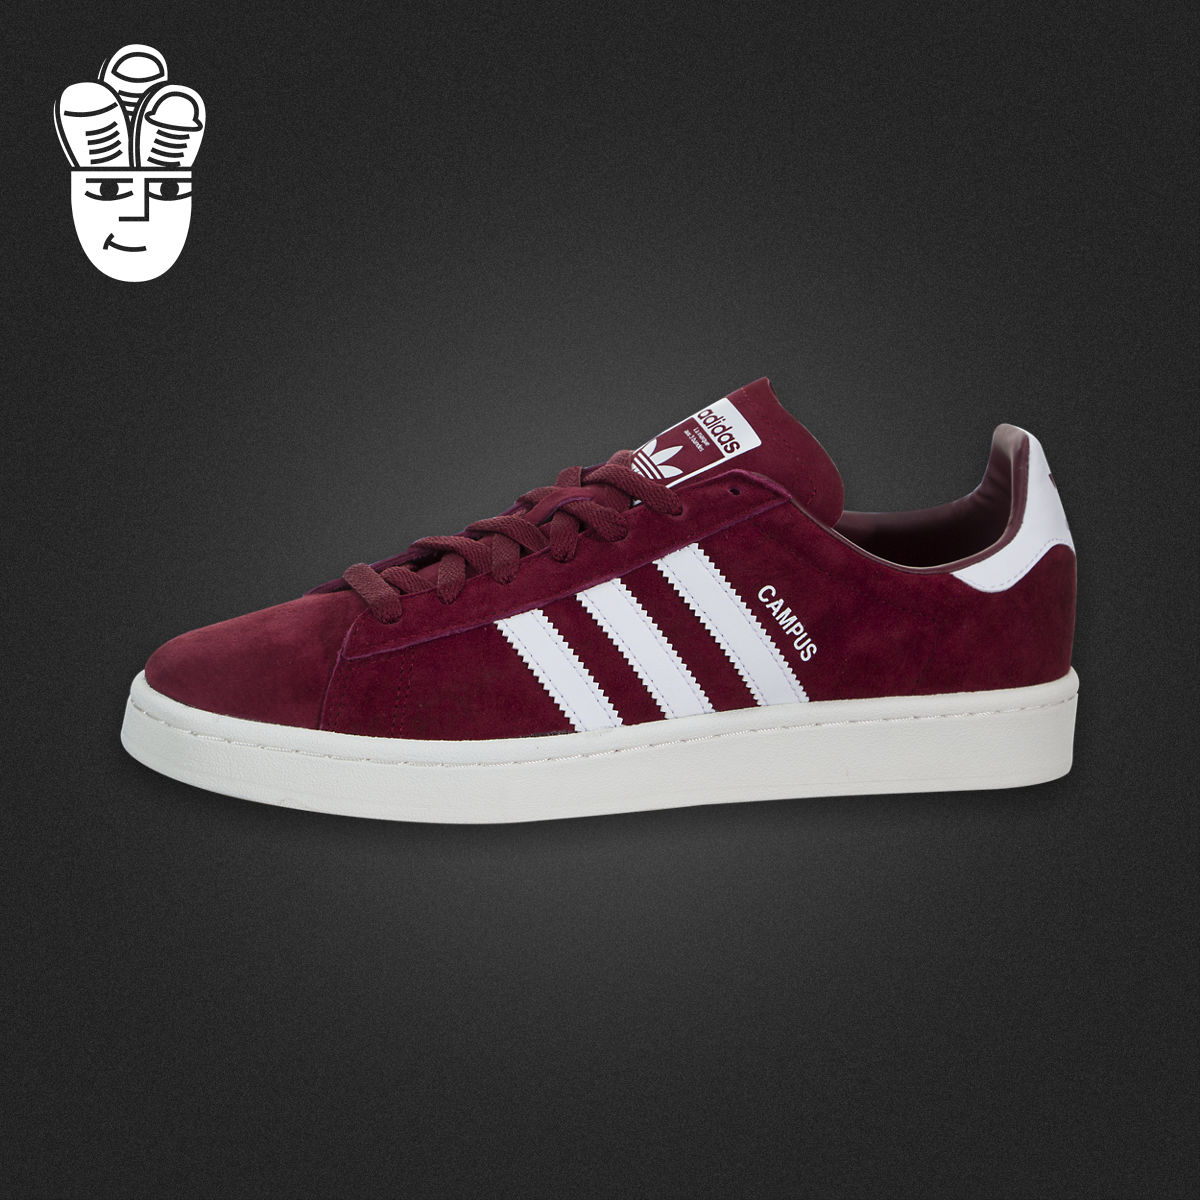 Adidas Campus 阿迪达斯男鞋 时尚三叶草板鞋 运动休闲鞋